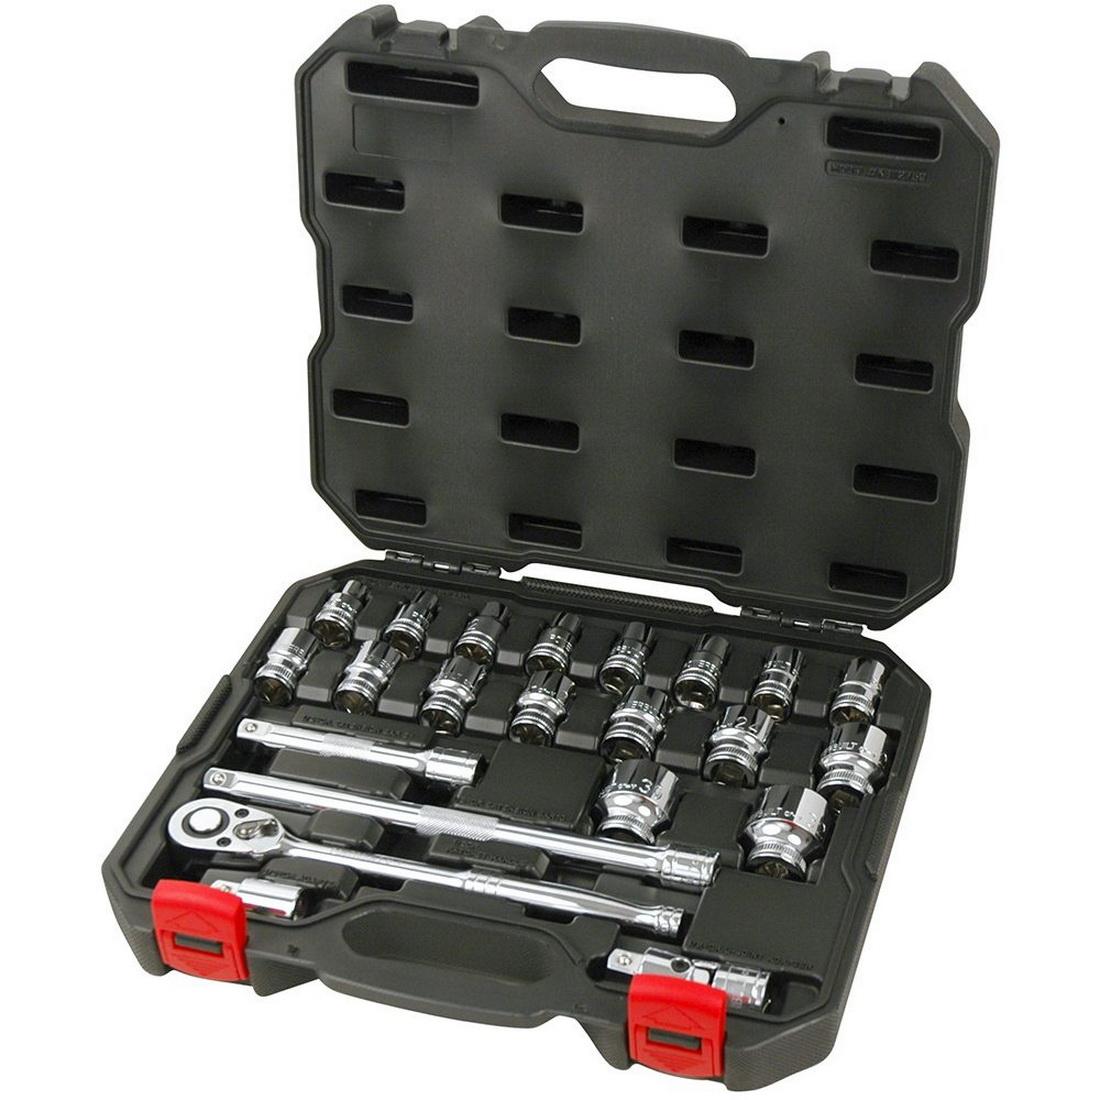 23 Piece Metric Socket Set 1/2 Inch Drive